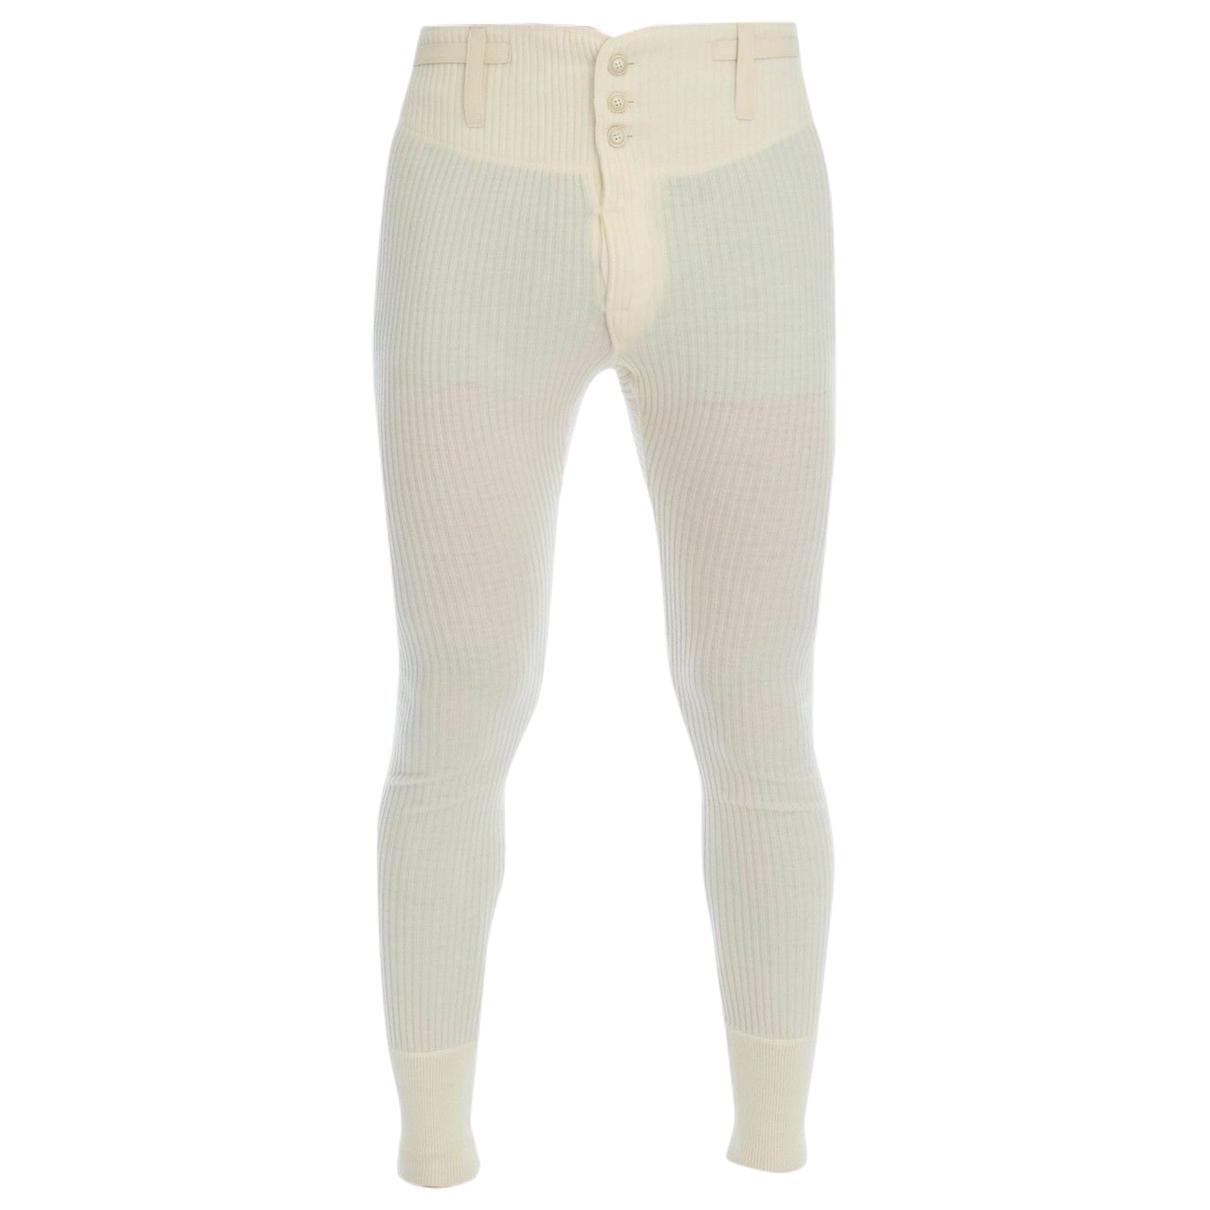 Dolce & Gabbana - Pantalon   pour homme en cachemire - blanc